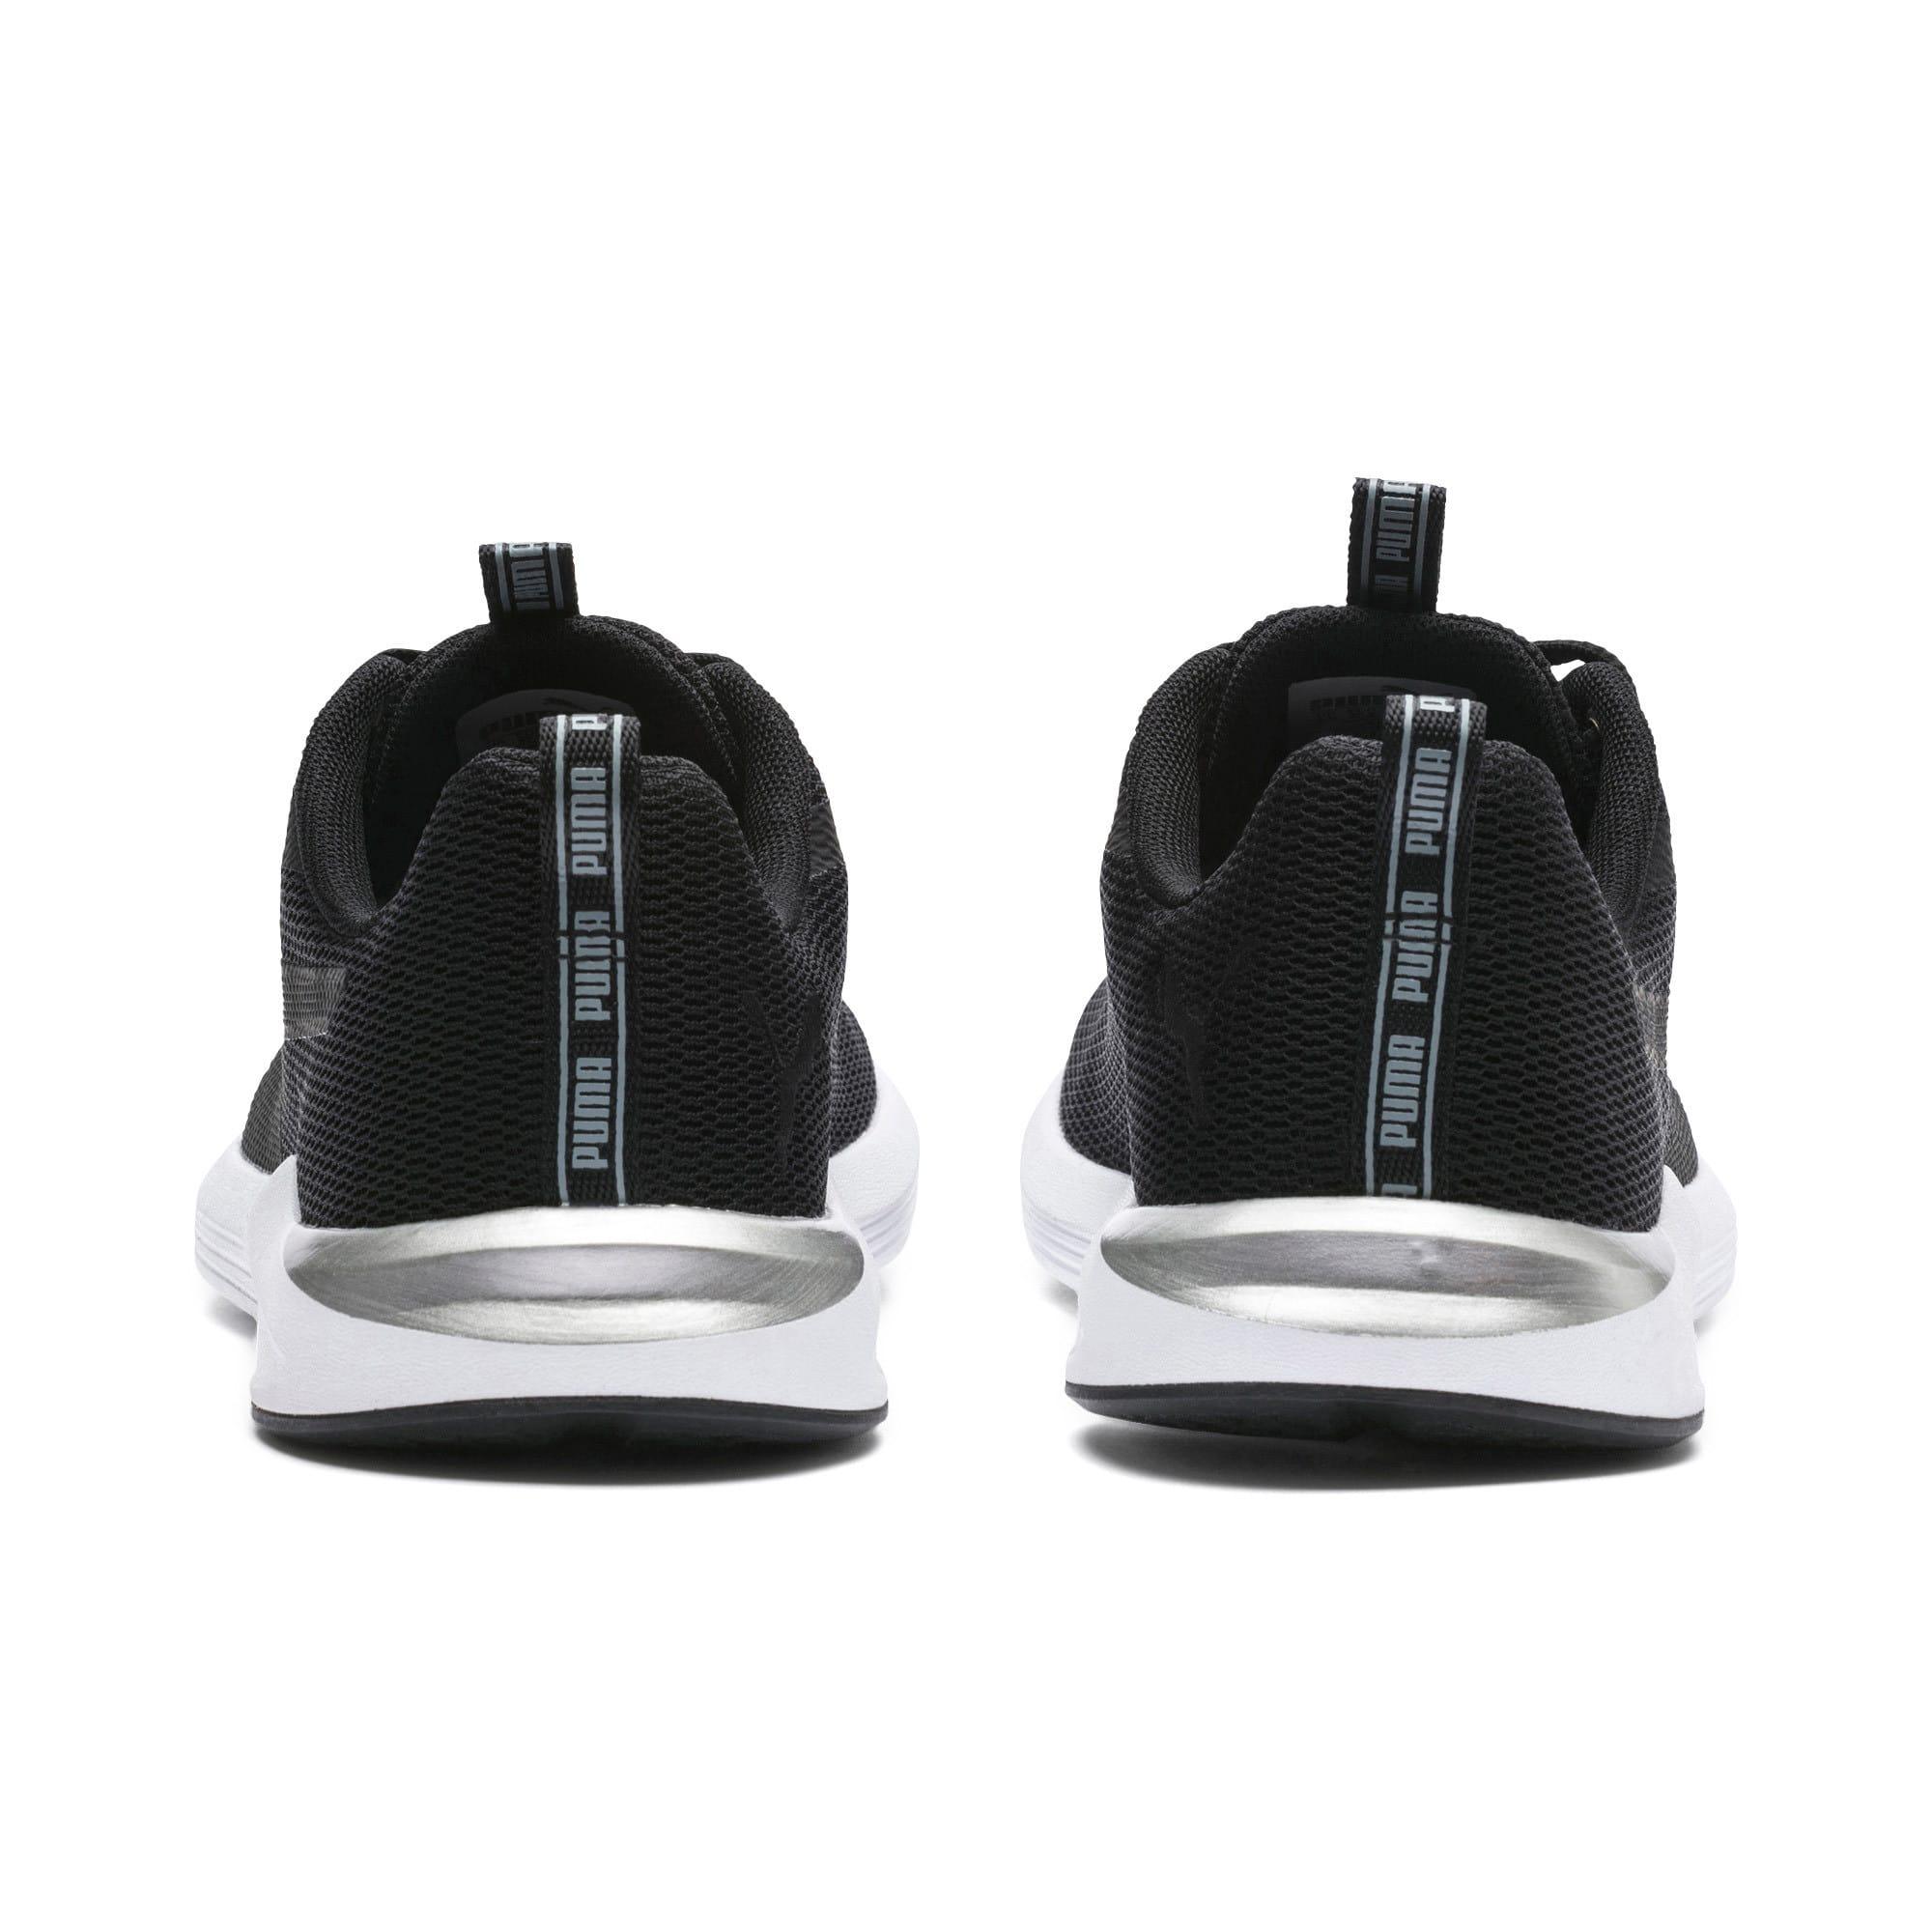 Thumbnail 3 of Prowl 2 Women's Training Shoes, Puma Black-Puma White, medium